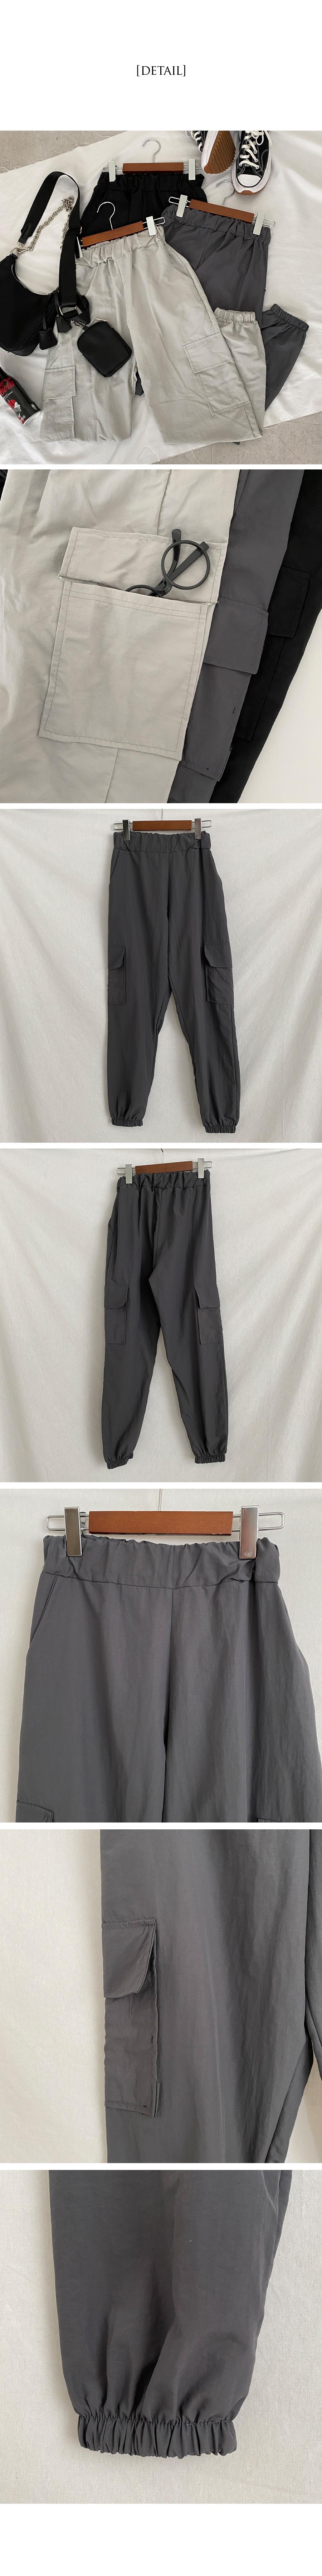 Cooling bustlock pocket jogger trousers